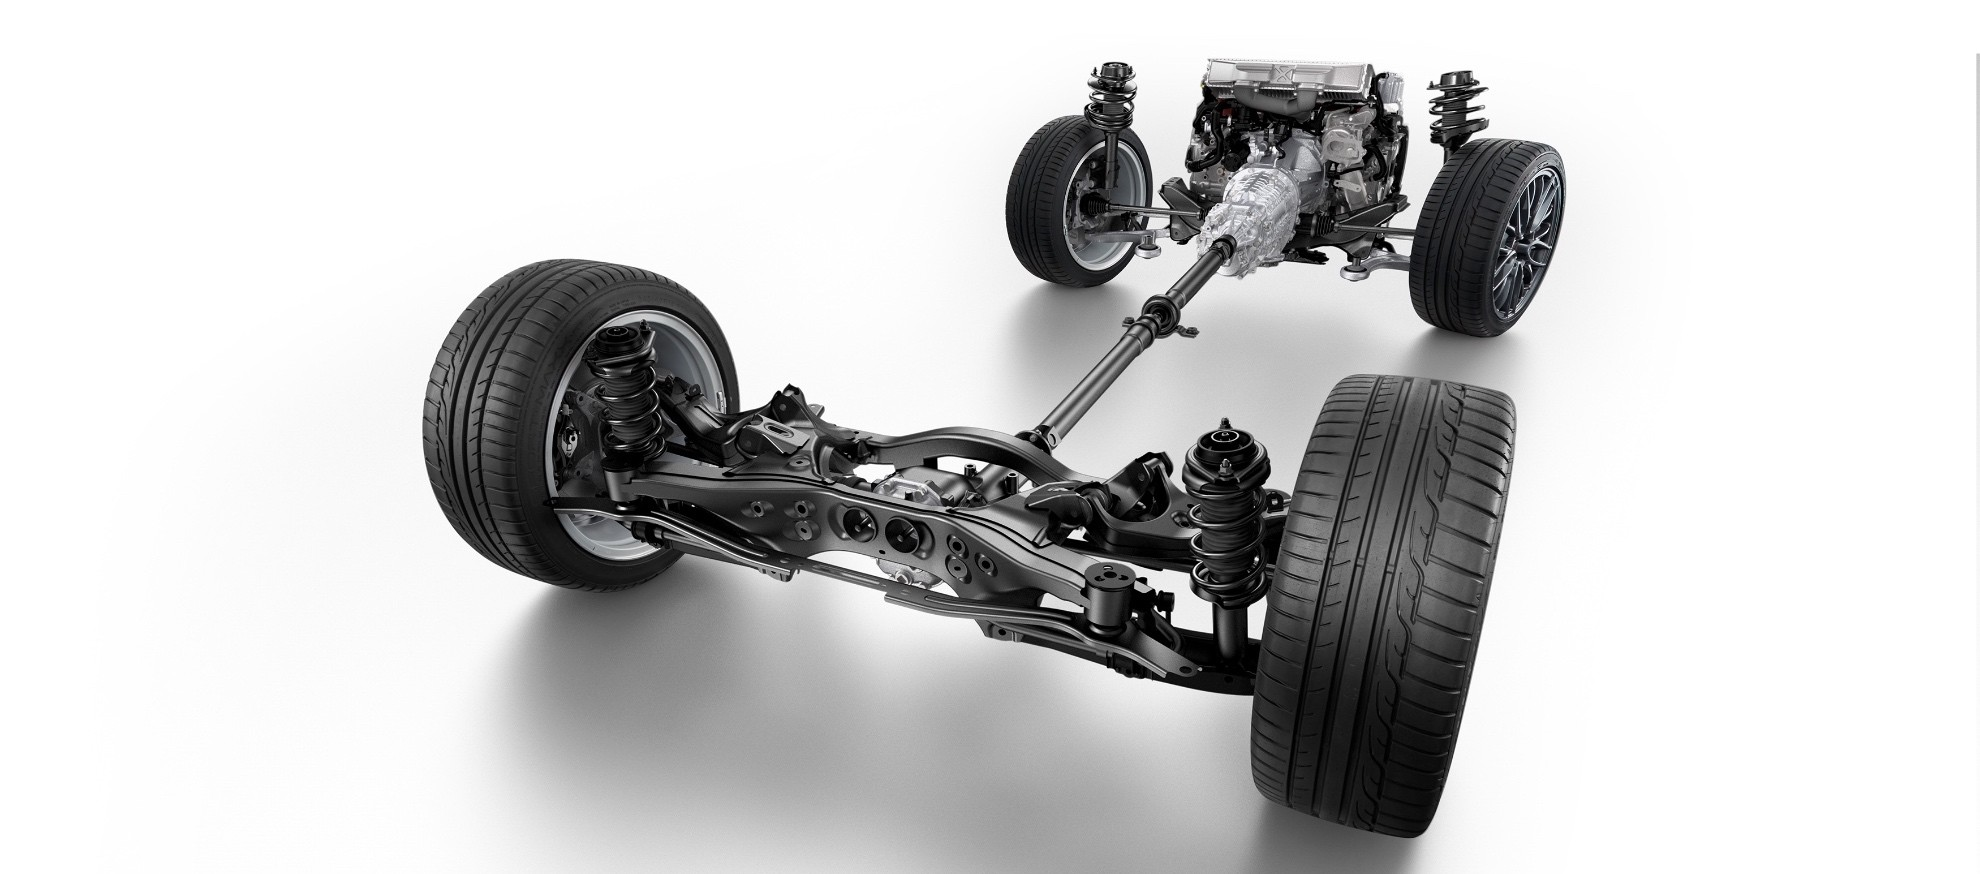 Subaru Symmetrical All Wheel Drive Four Decades Of Evolution